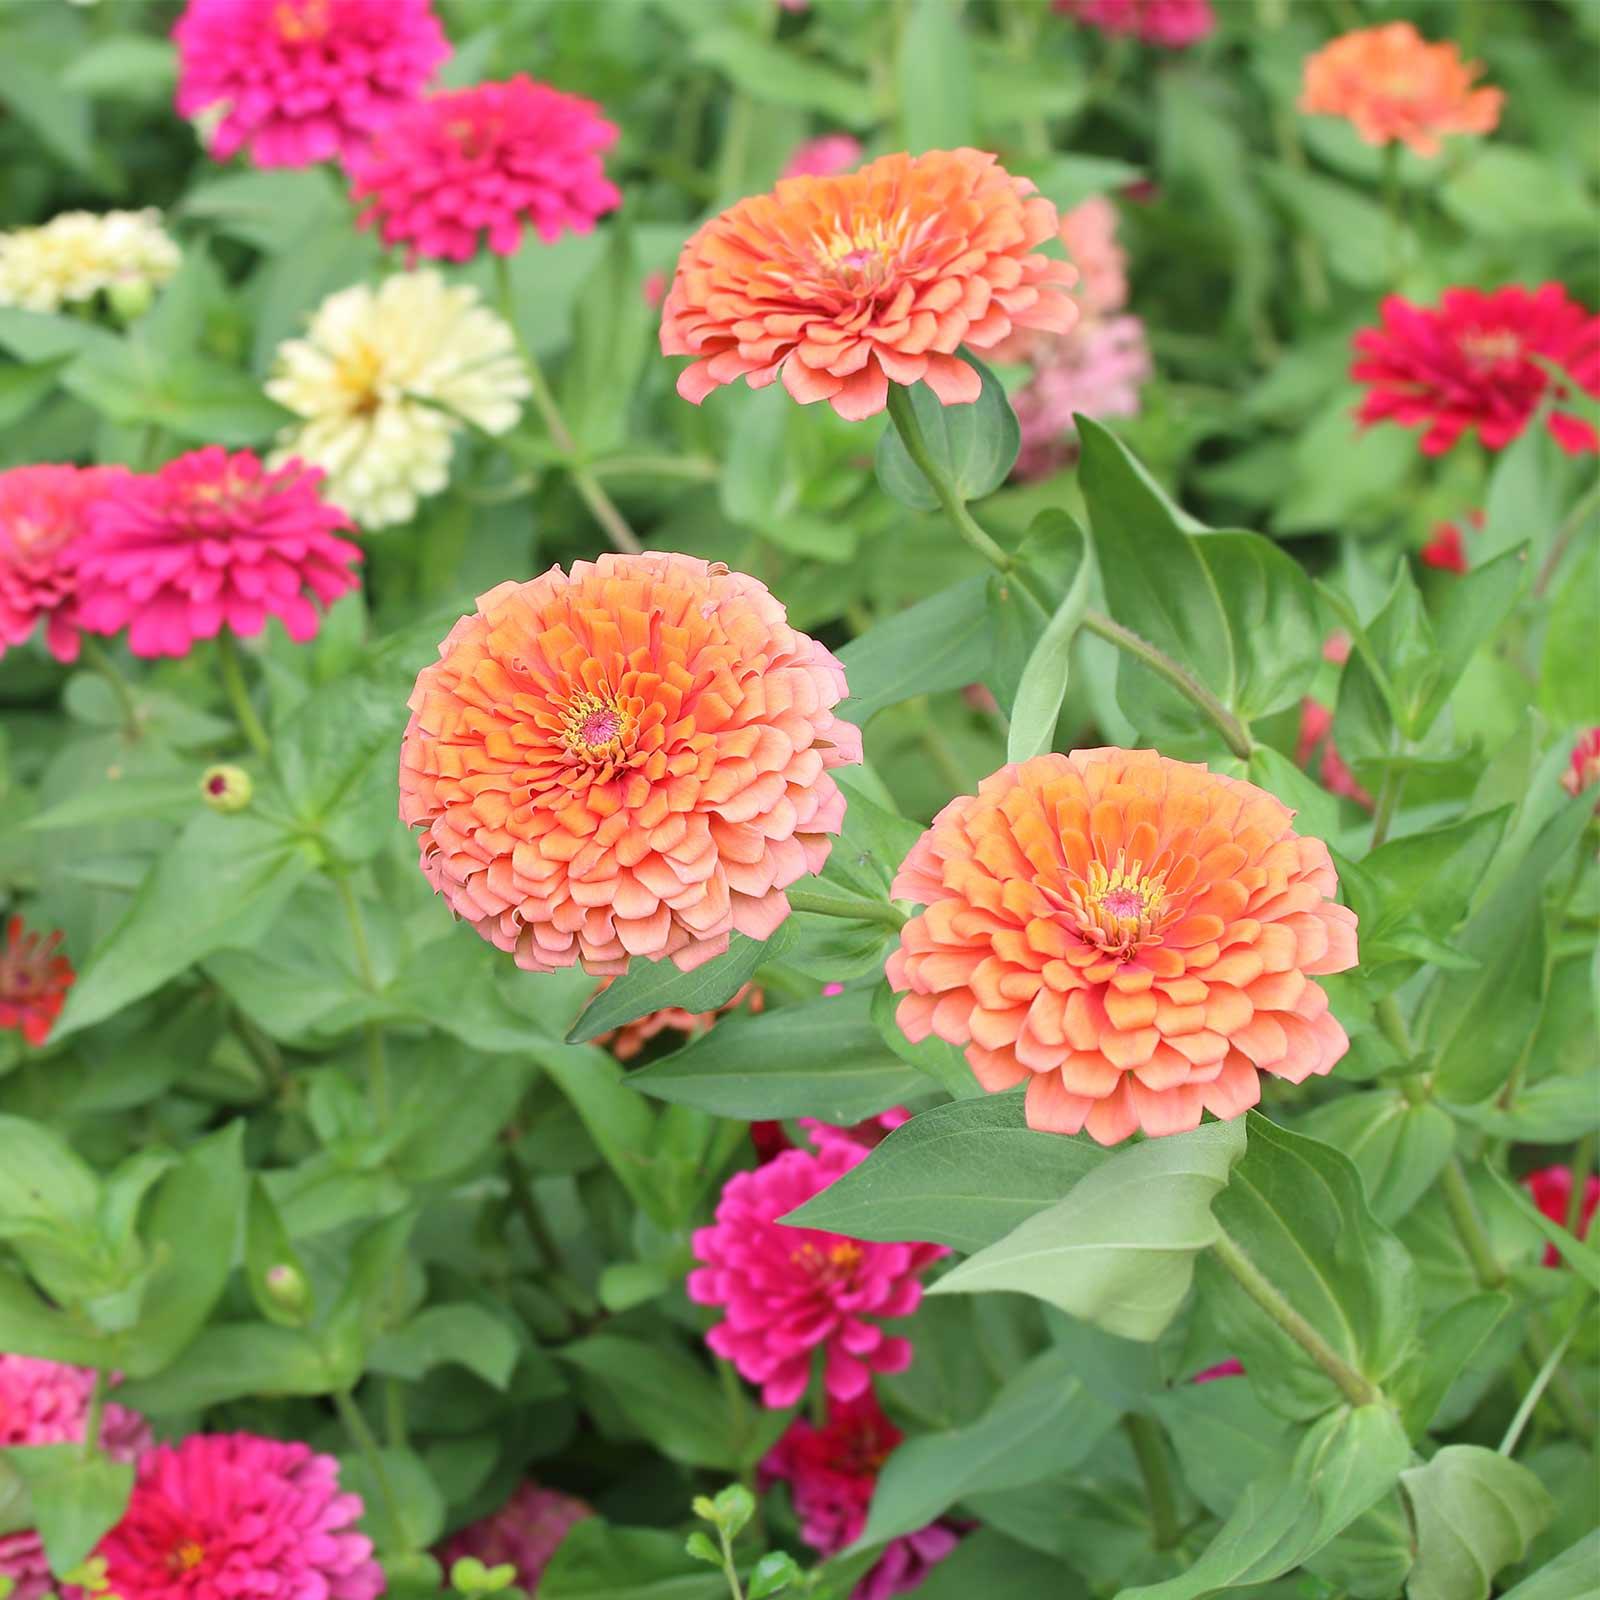 Mountain Valley Seed Company Seeds: Zinnia Flower Garden - Dreamland Mixture - Orange - 500 Seeds